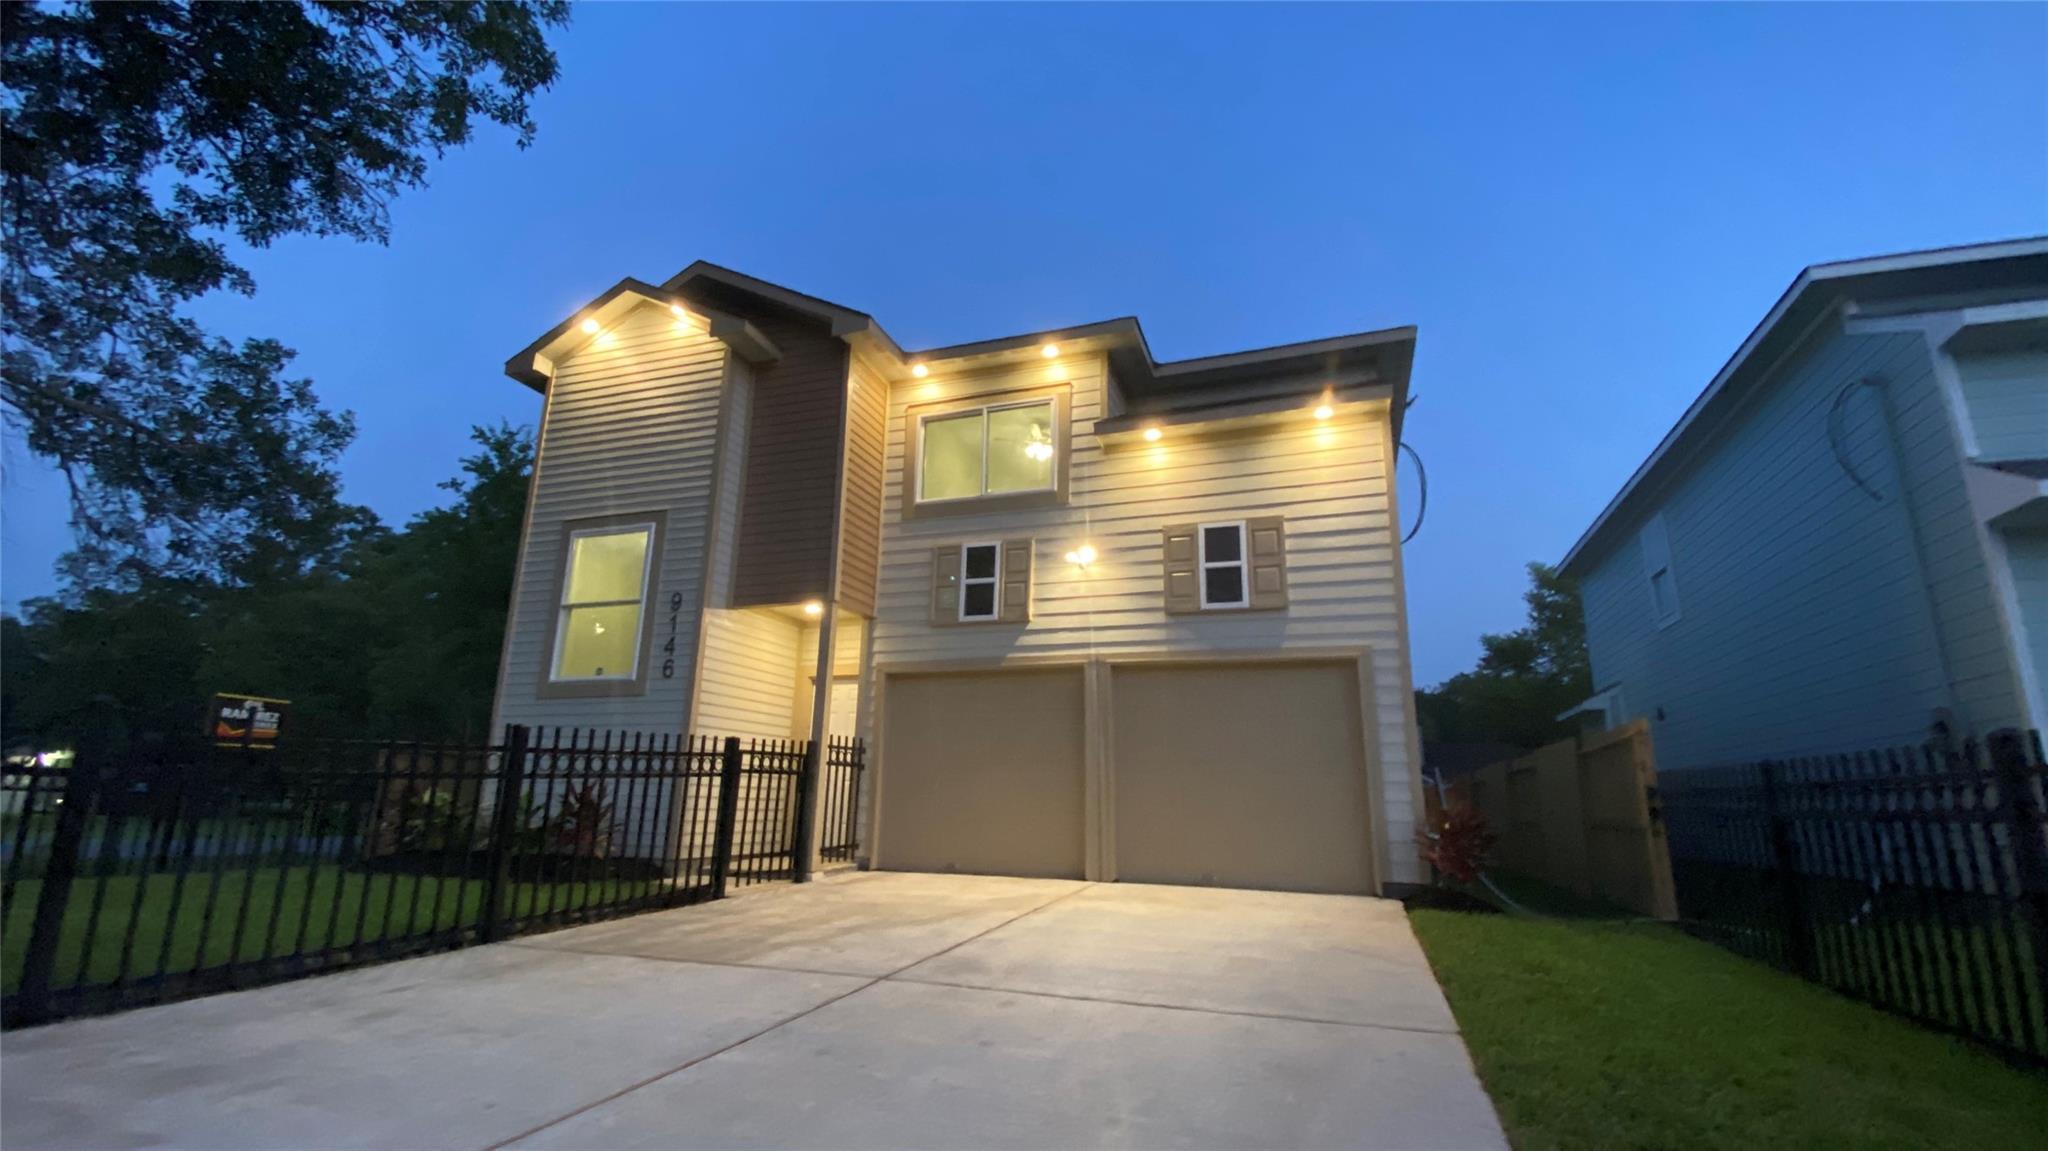 9146 Freeland Property Photo - Houston, TX real estate listing